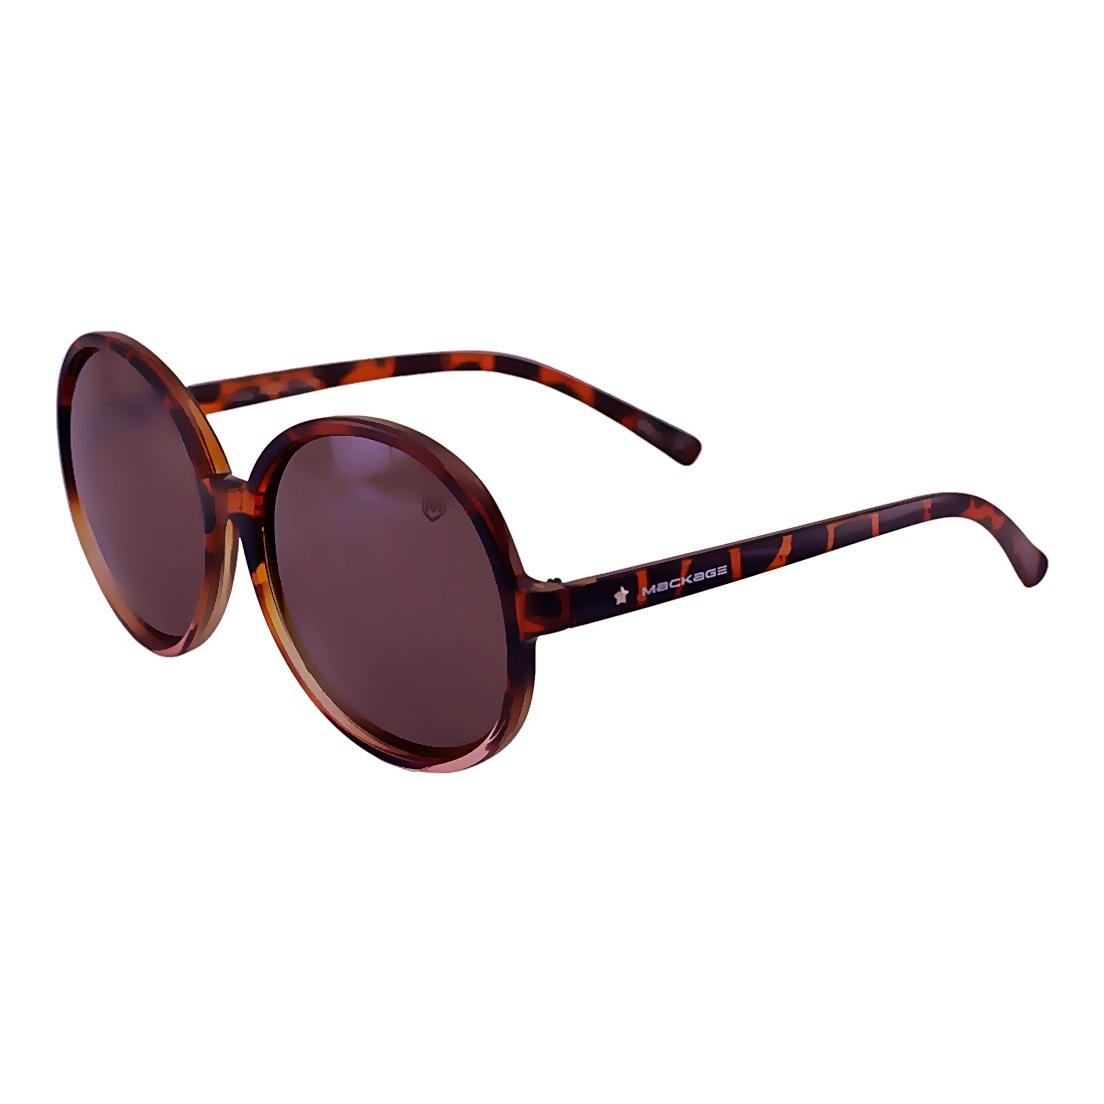 Óculos de Sol Mackage Feminino Oversize Redondo - Tartaruga